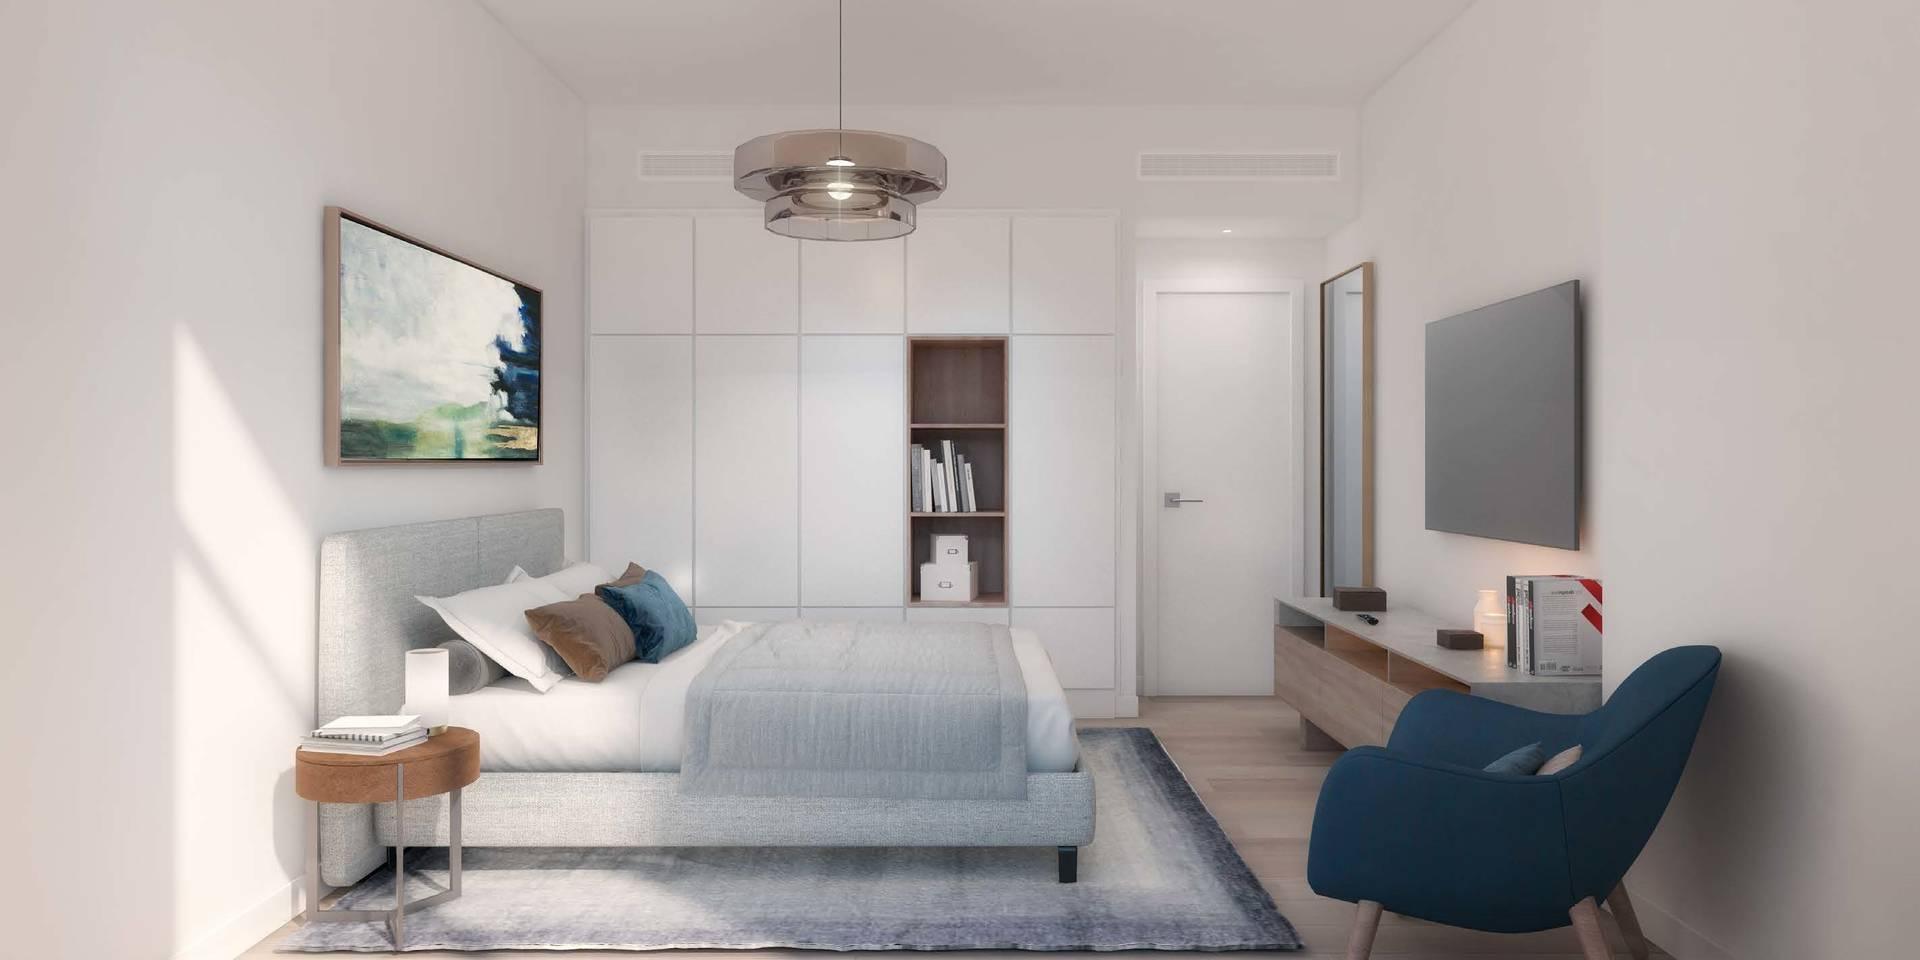 Апартаменты, sale в La Voile Дубай, ОАЭ